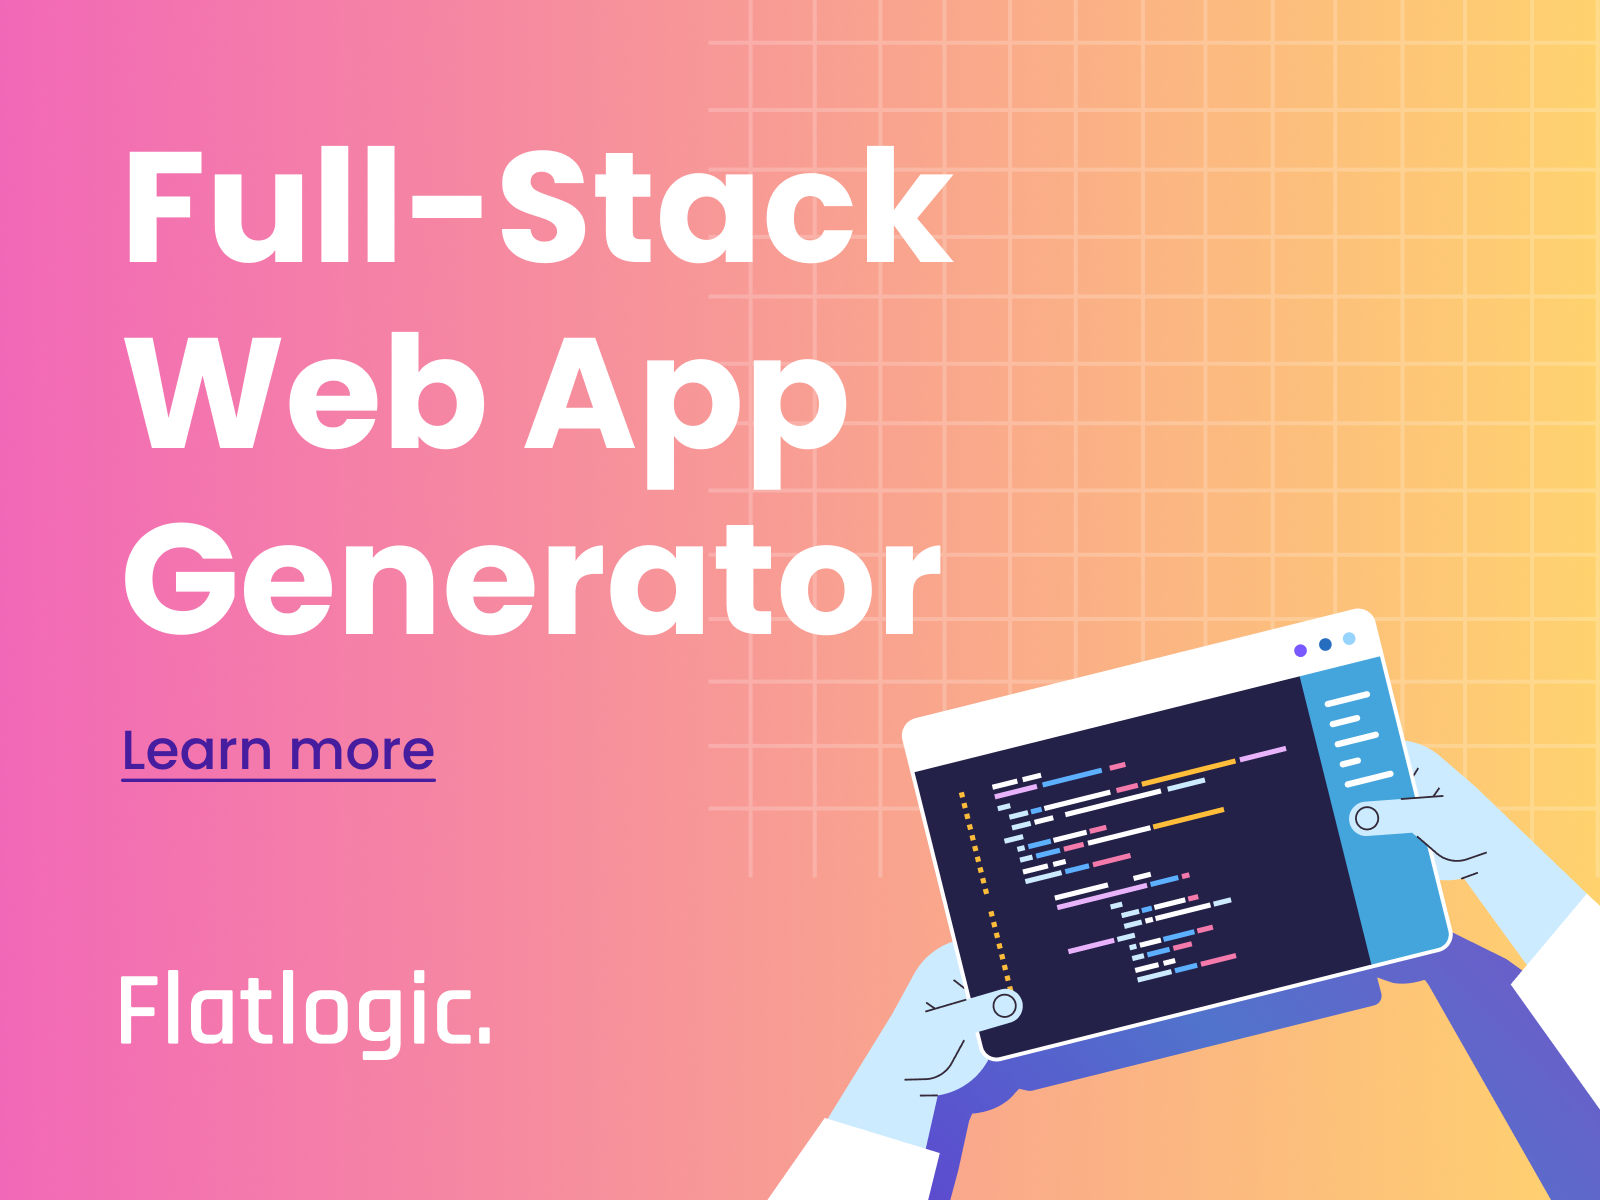 Full Stack Web Application Generator by Flatlogic